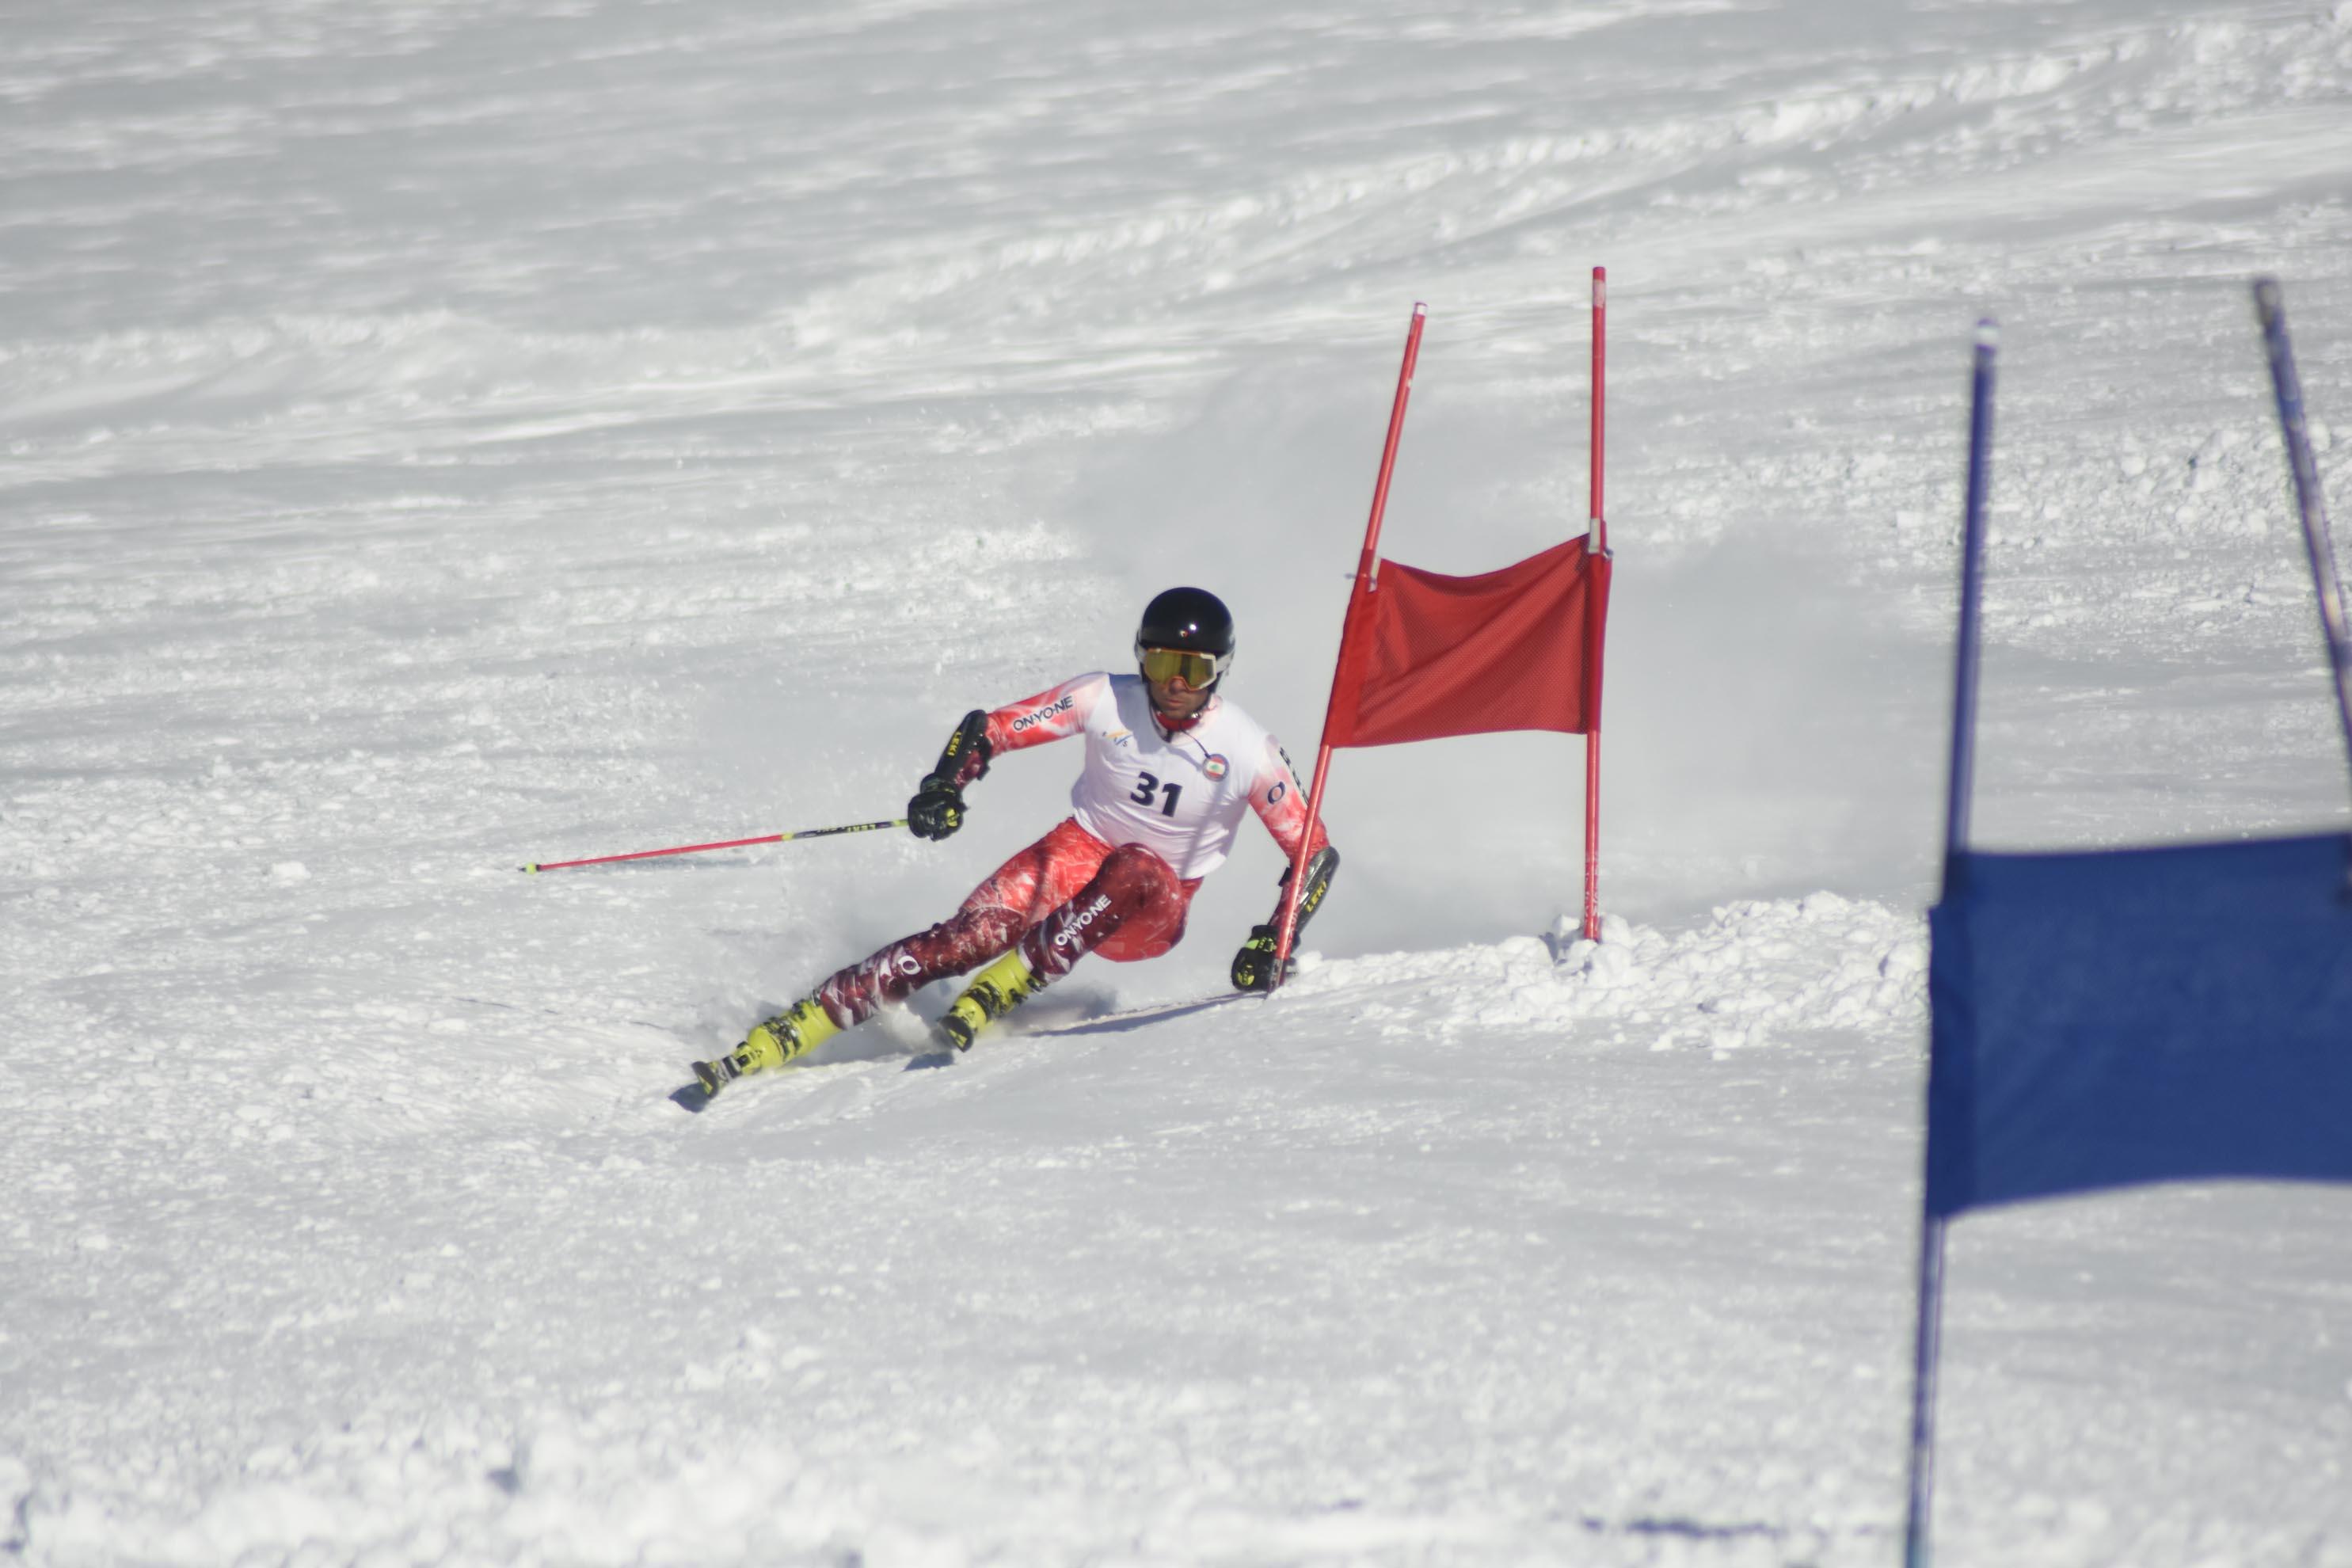 1484326791_ski